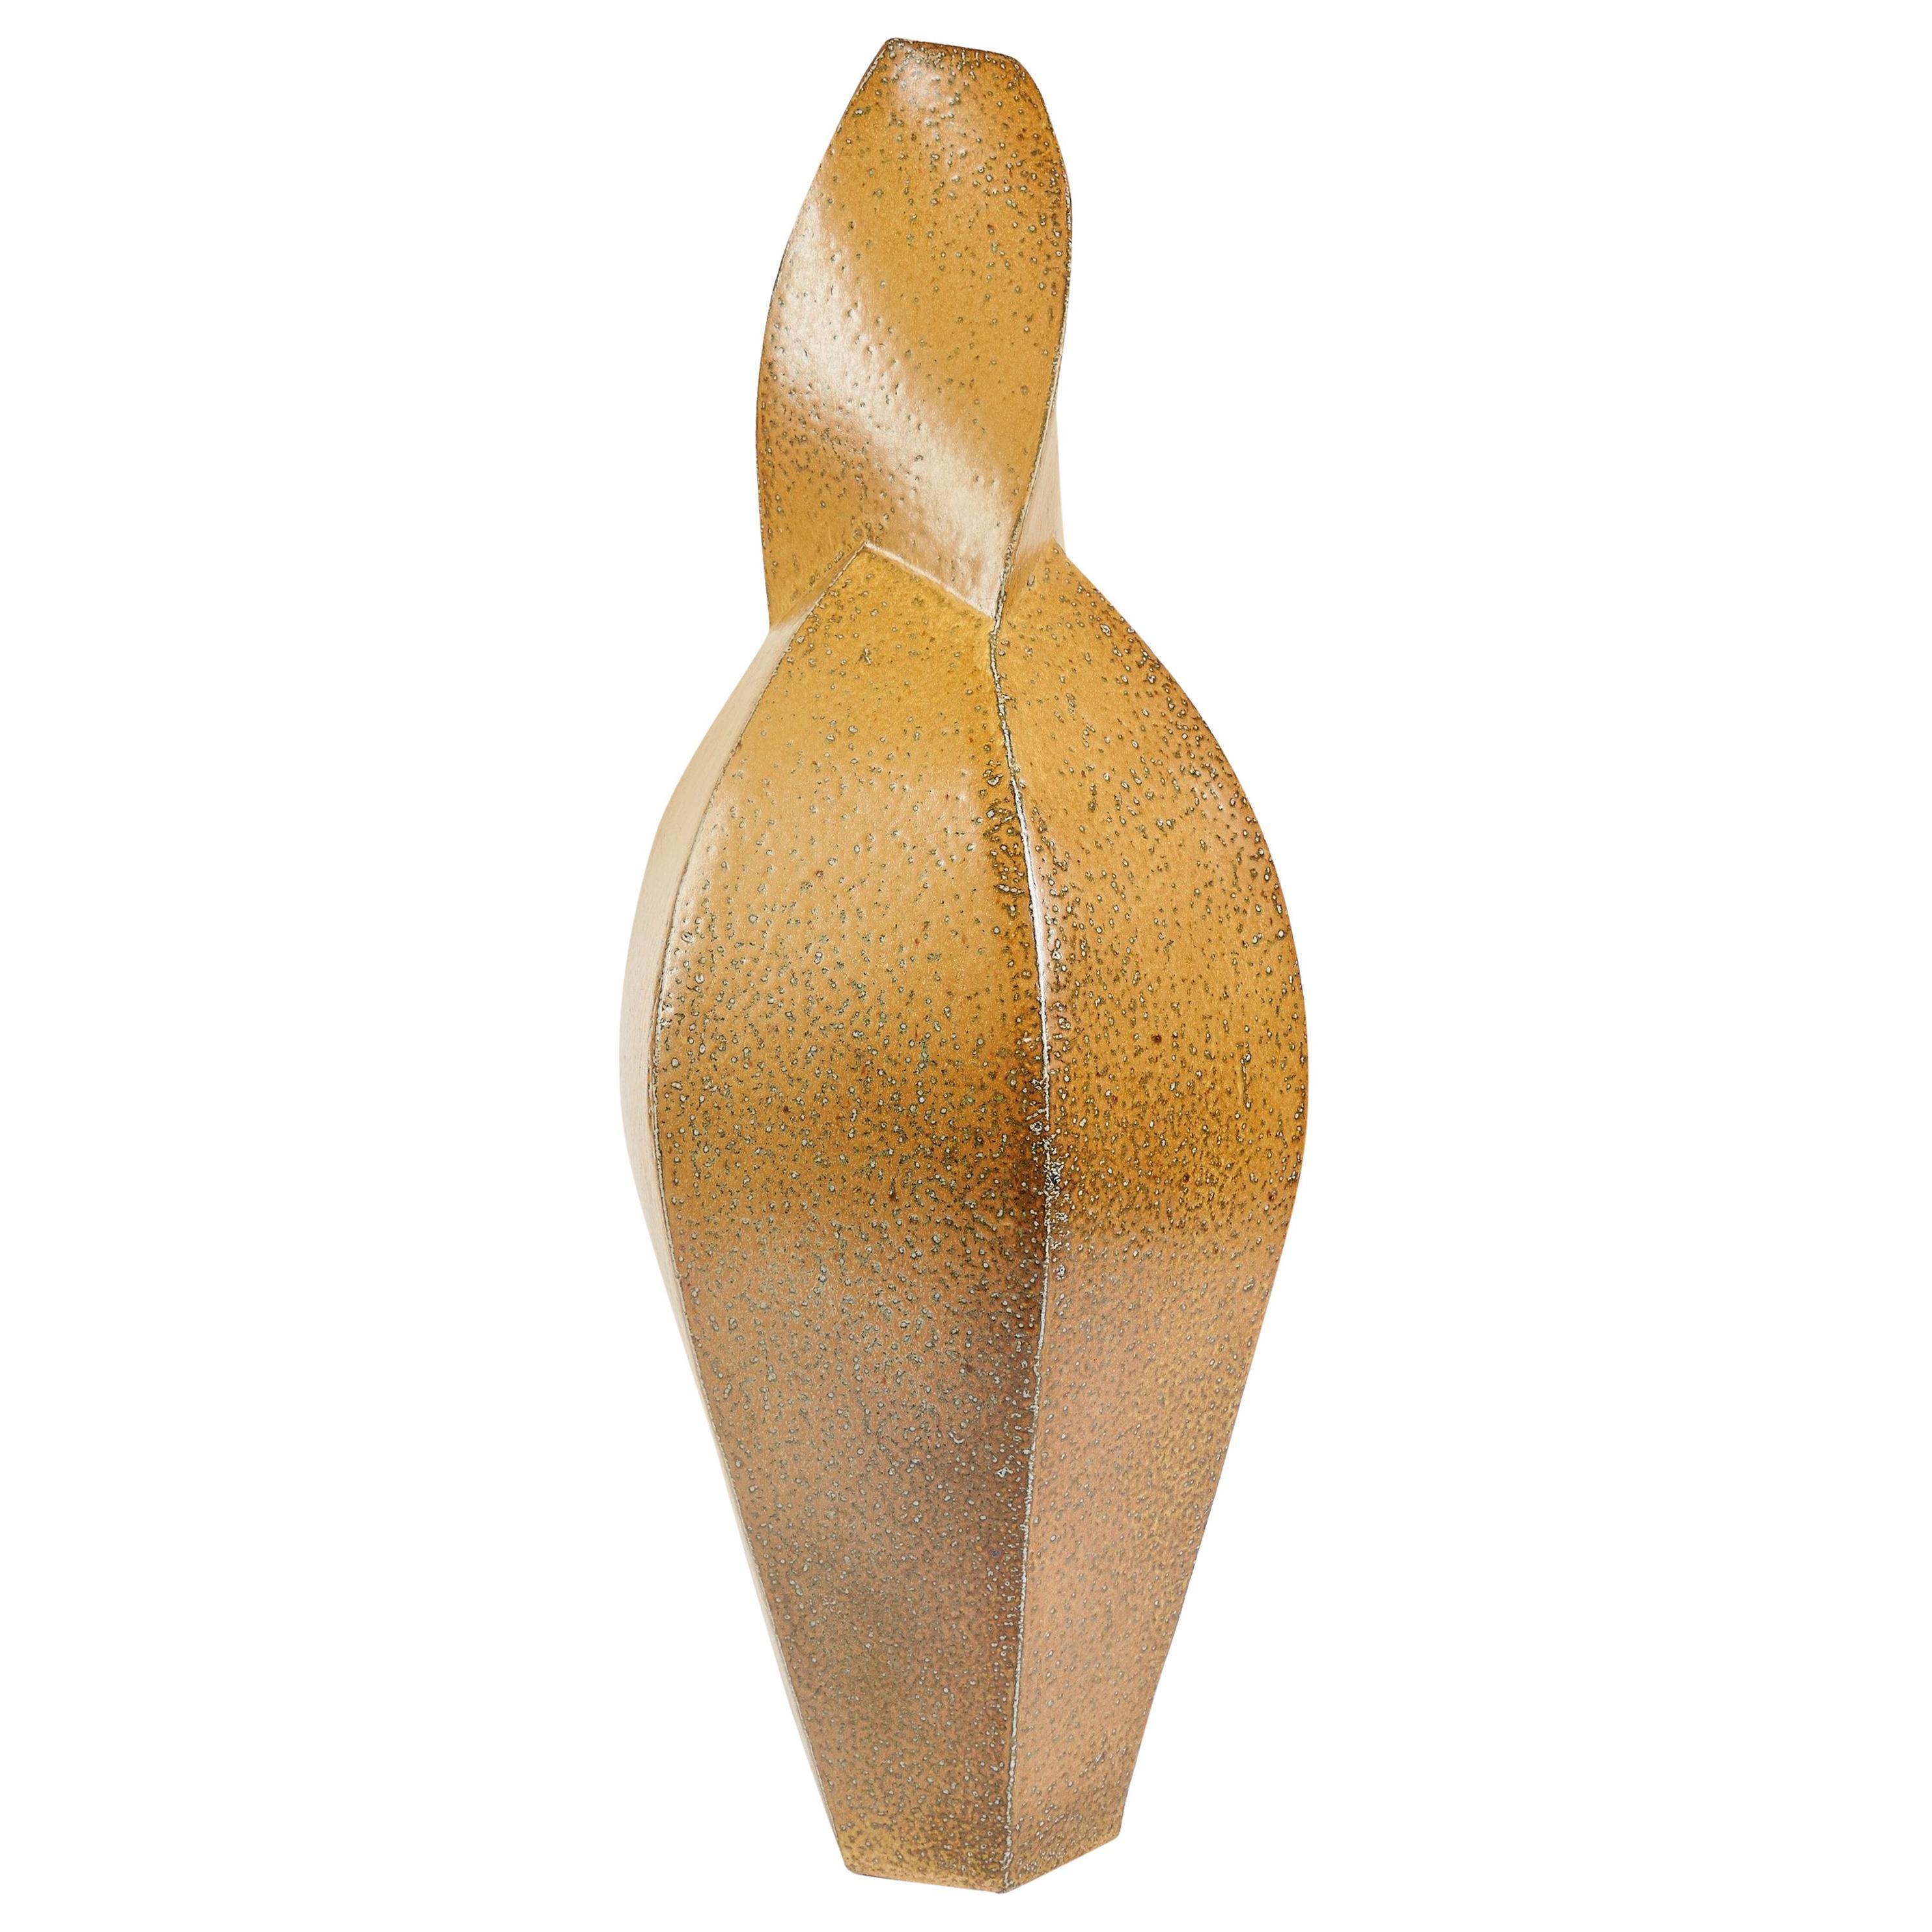 Aage Birck, Twisting Ceramic Vase, Denmark, 2012